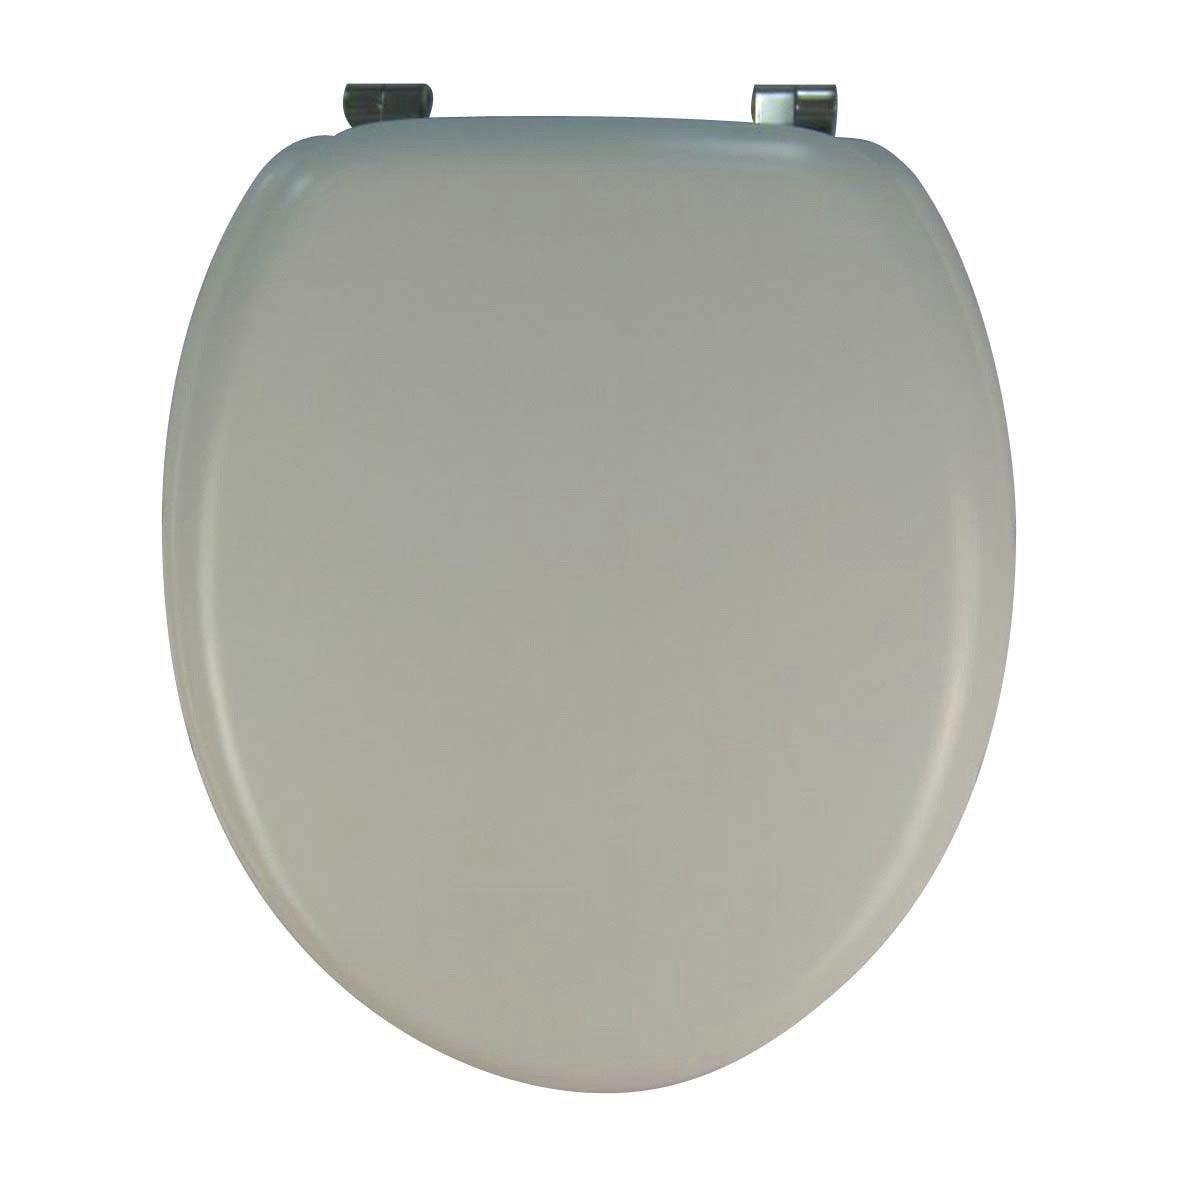 Abattant wc sensea mateo blanc leroy merlin - Accessoires wc leroy merlin ...